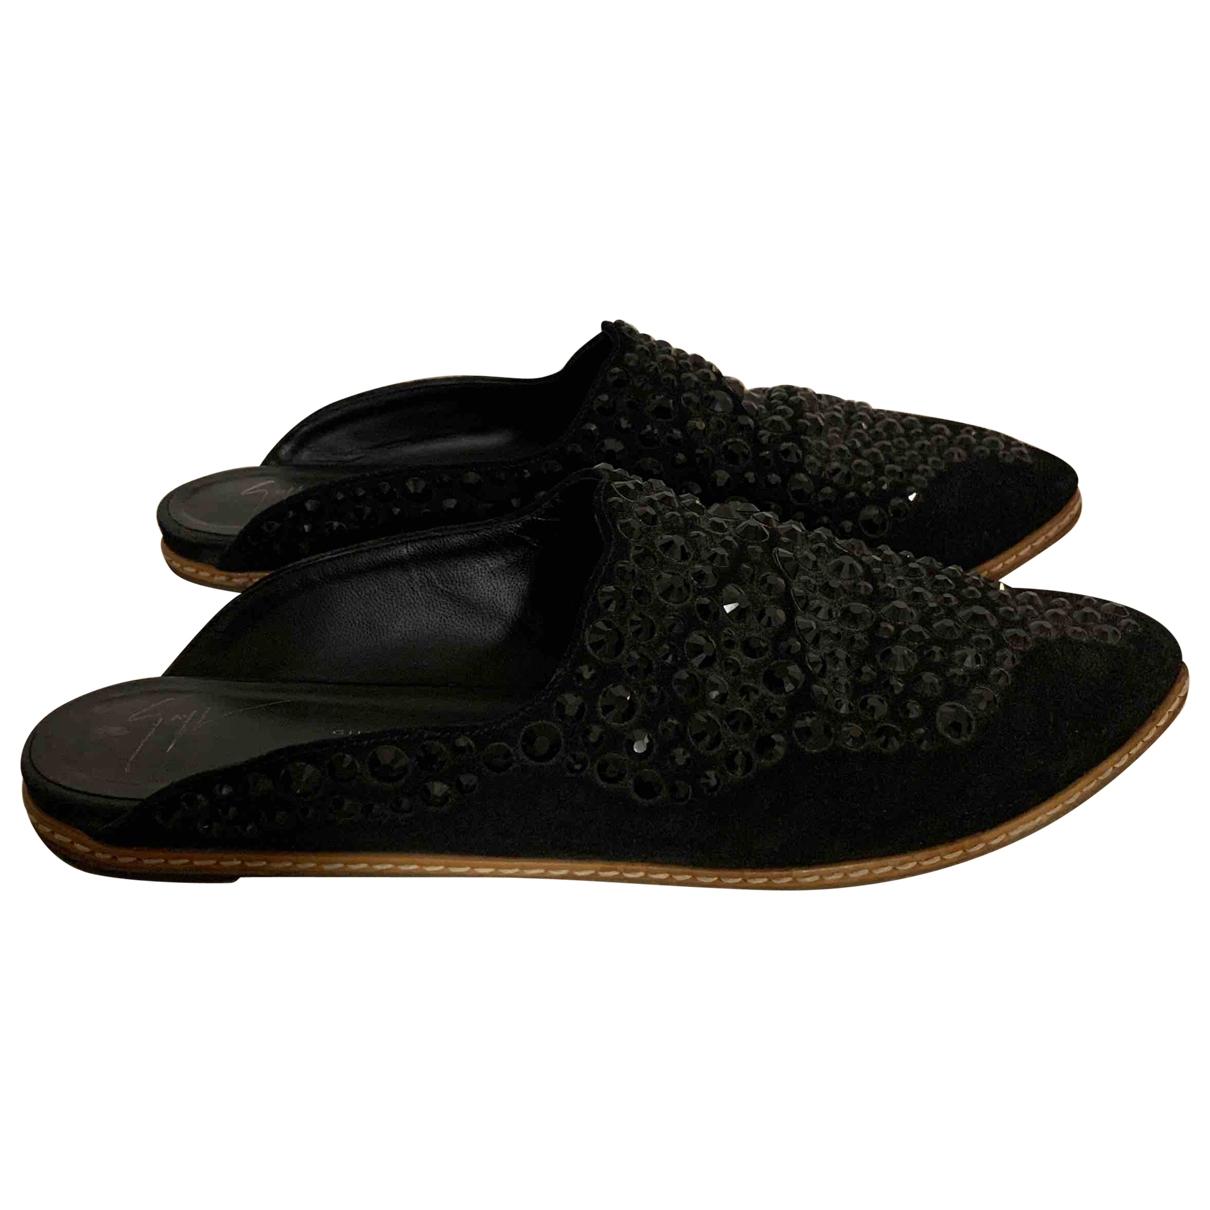 Giuseppe Zanotti \N Black Leather Sandals for Women 41 EU